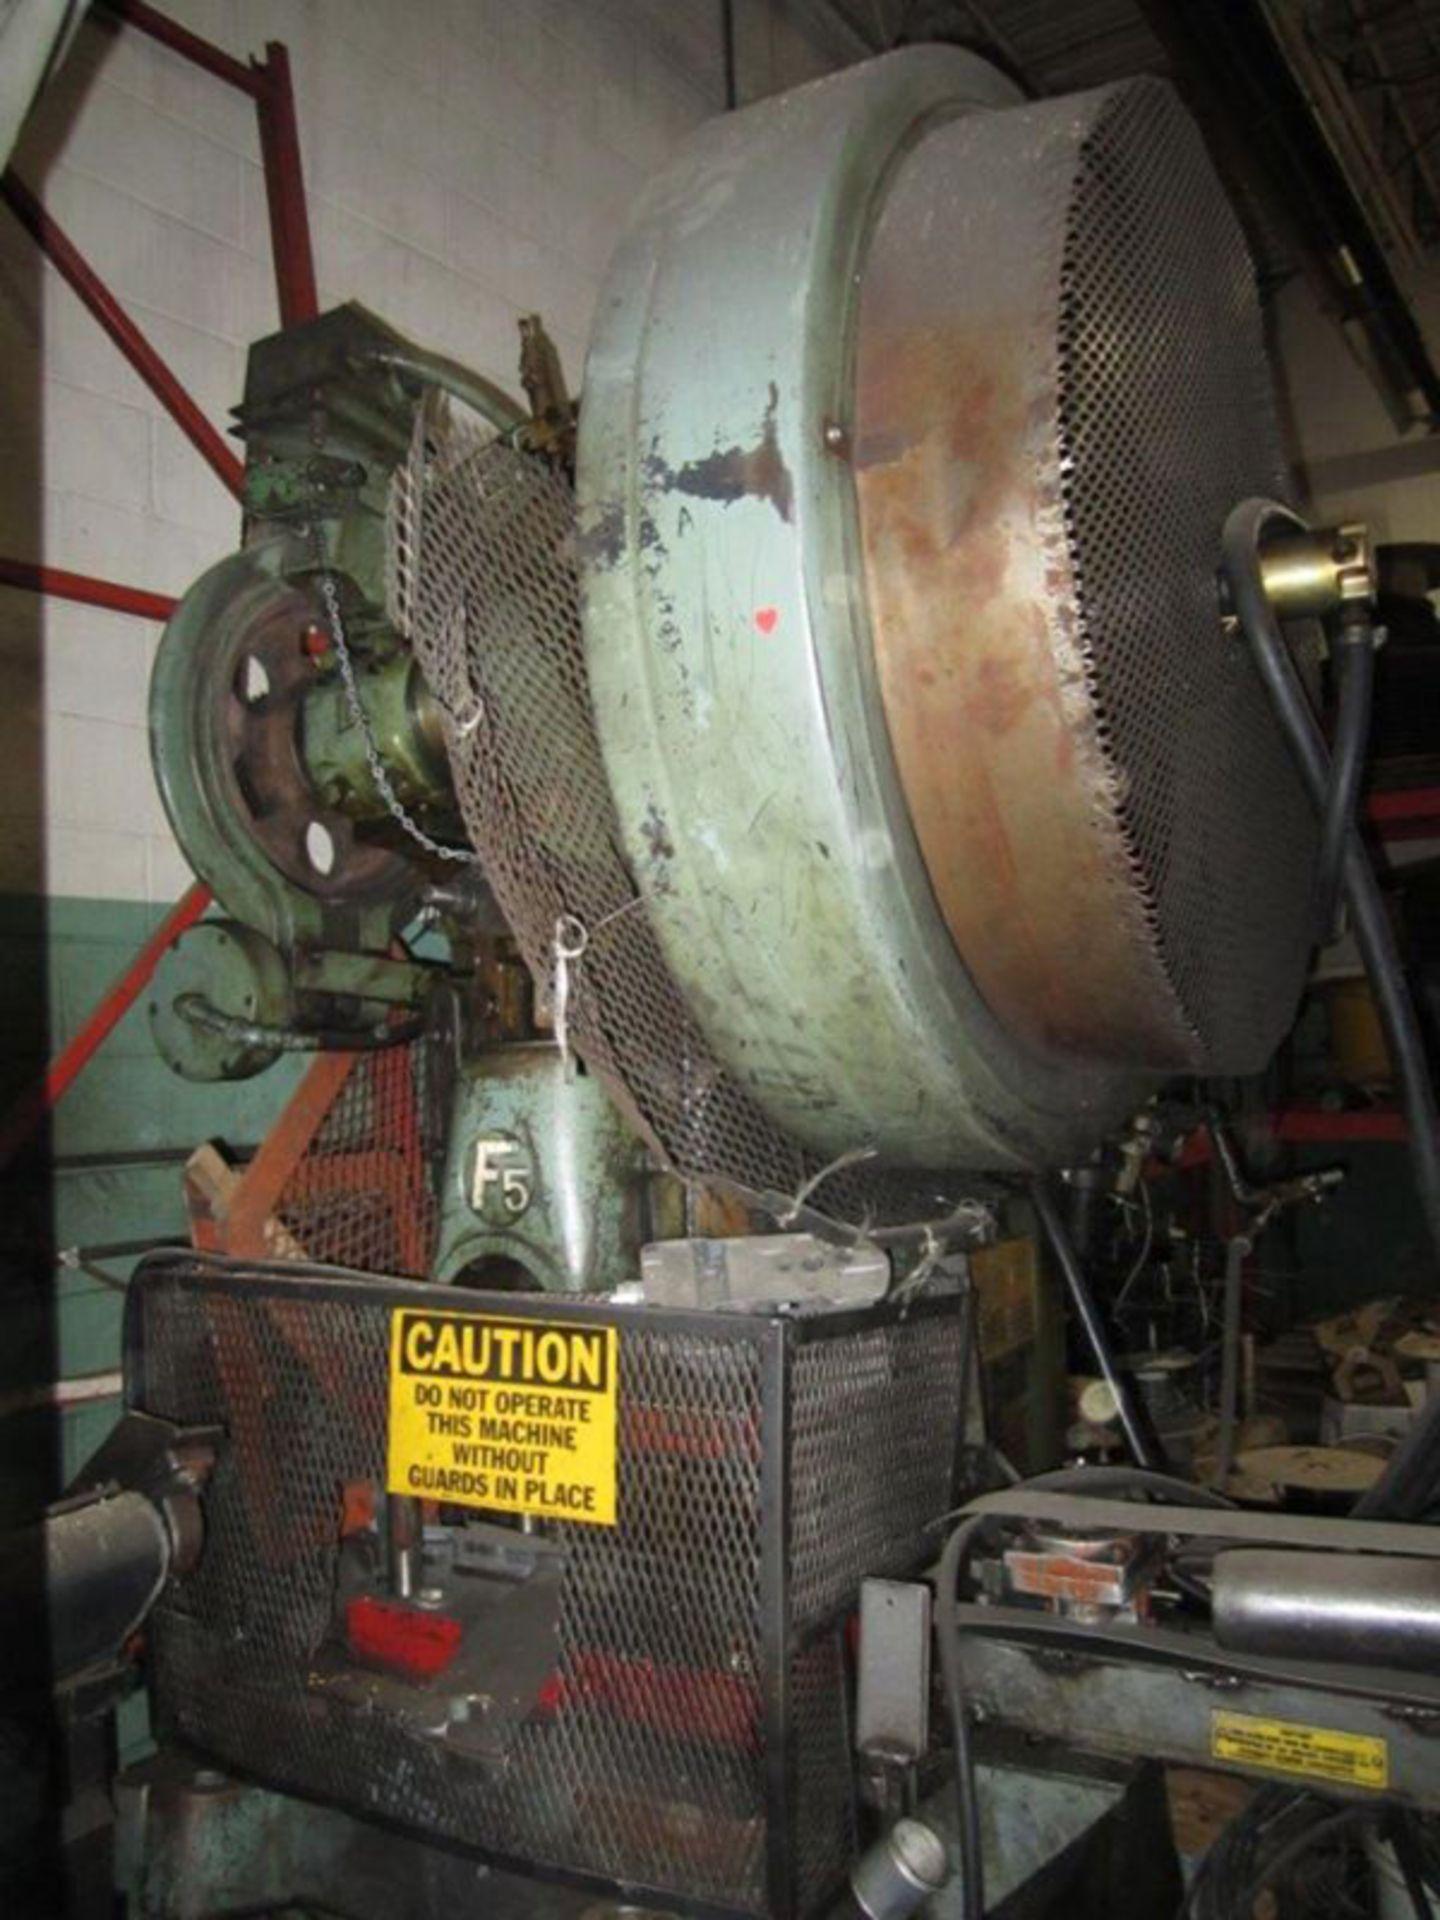 "Federal OBI Punch Press   60-Ton x 29 1/2"" x 18 1/2"", Mdl: F-5, S/N: 125400 - 6397P - Image 2 of 6"